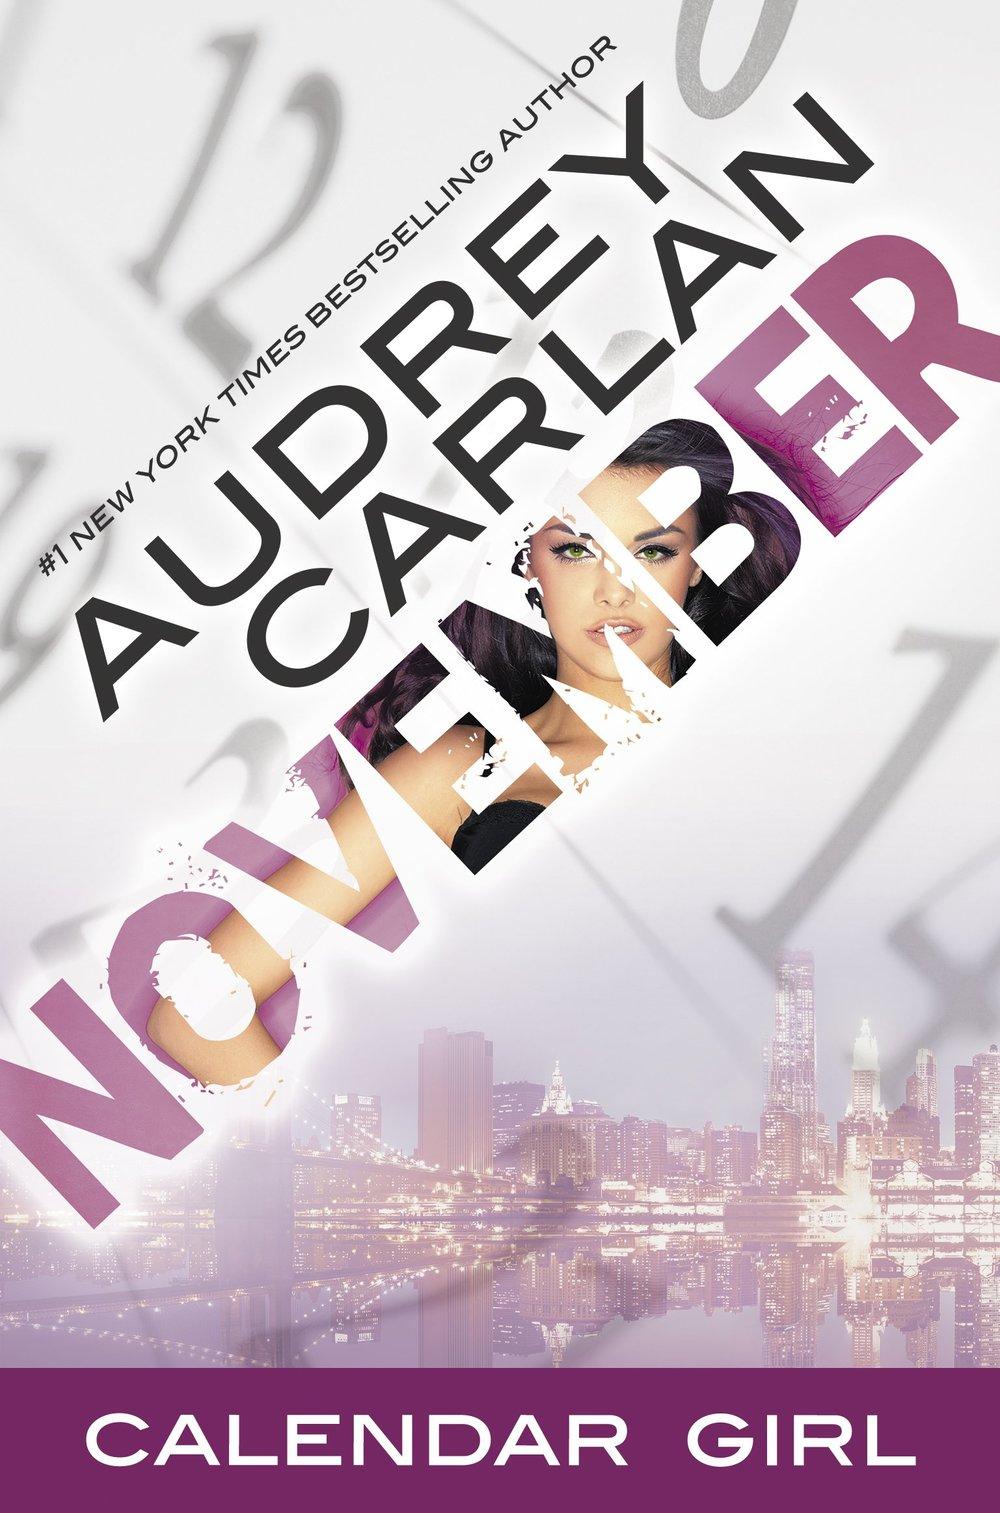 Audrey Carlan November